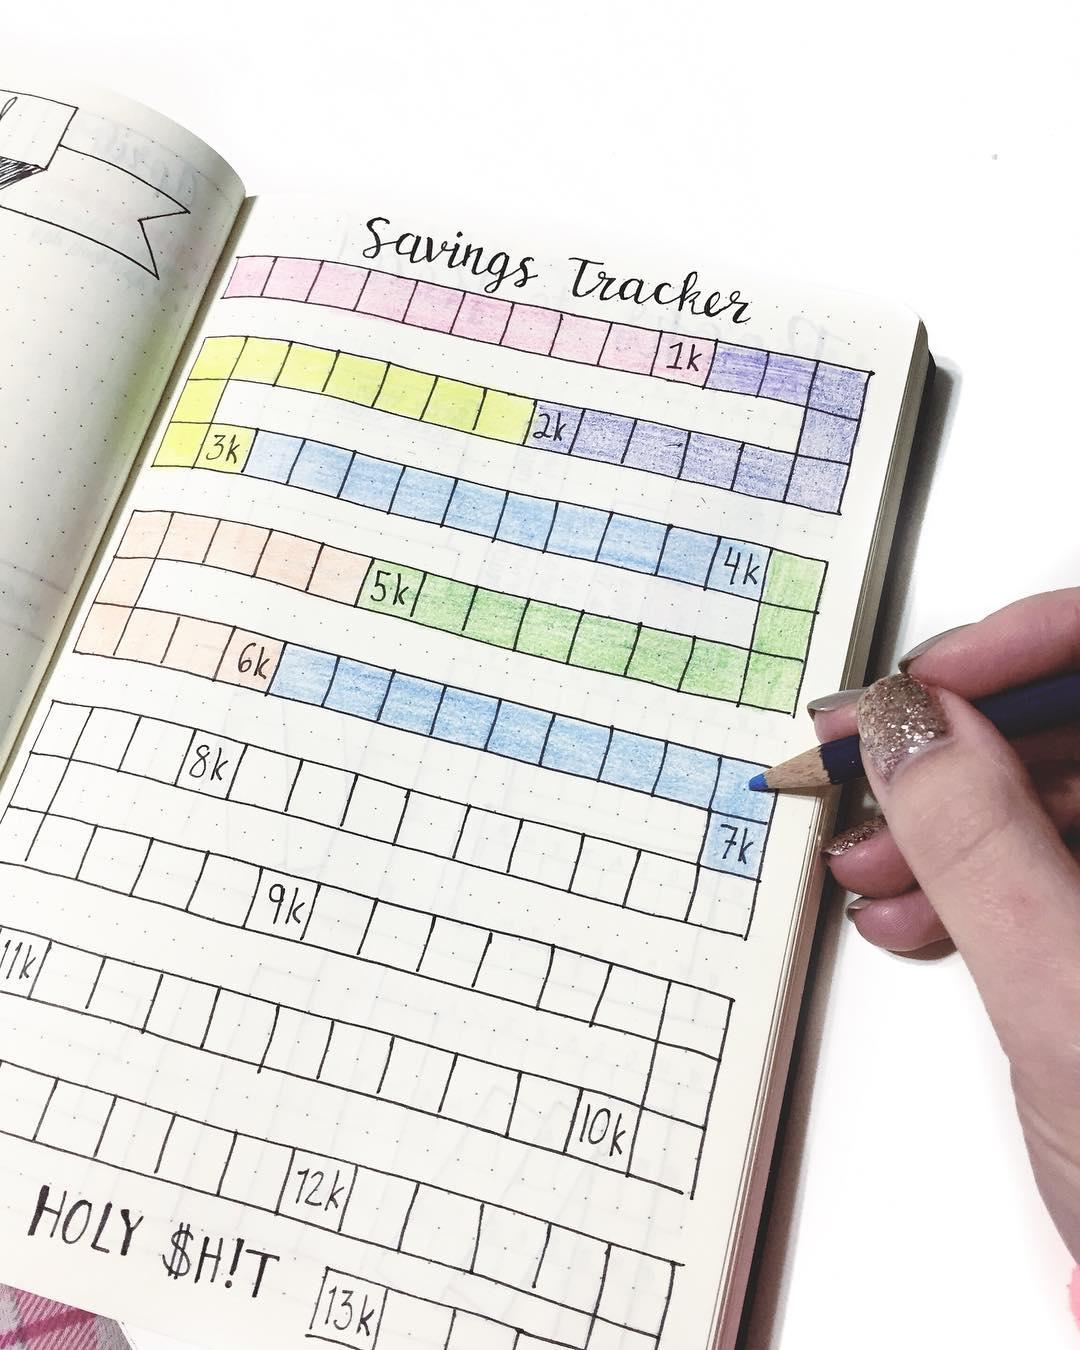 Savings Coloring Book Tracker